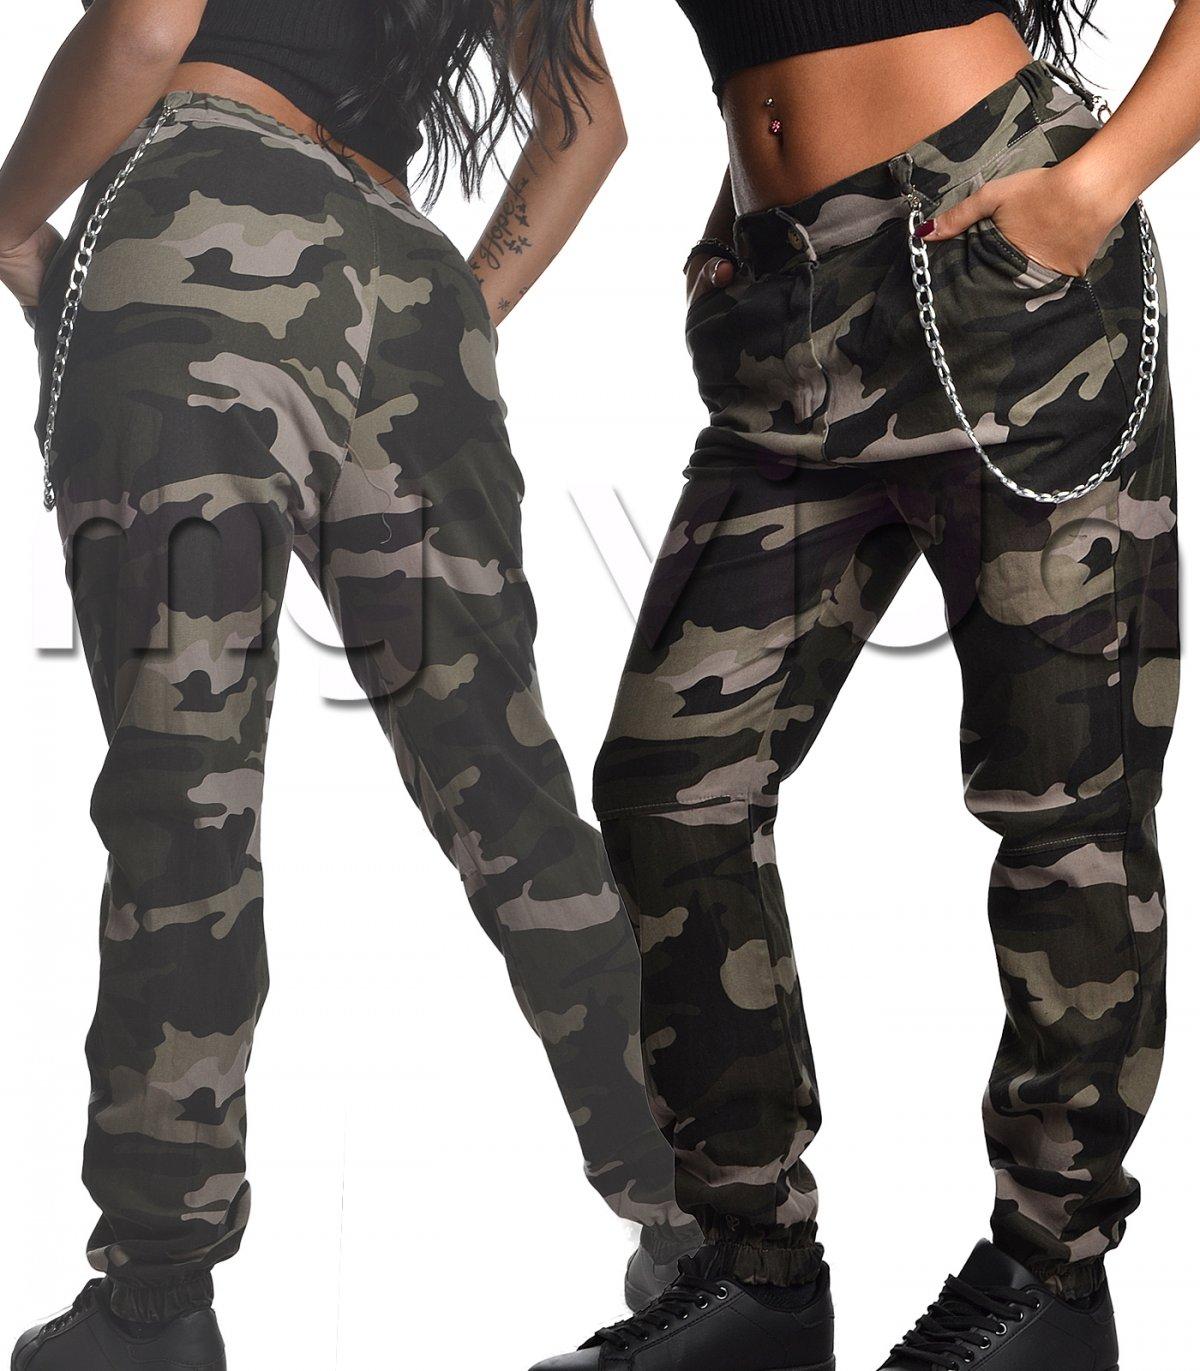 ef70dcab0c Pantalone donna camouflage elastico caviglia | My Vida